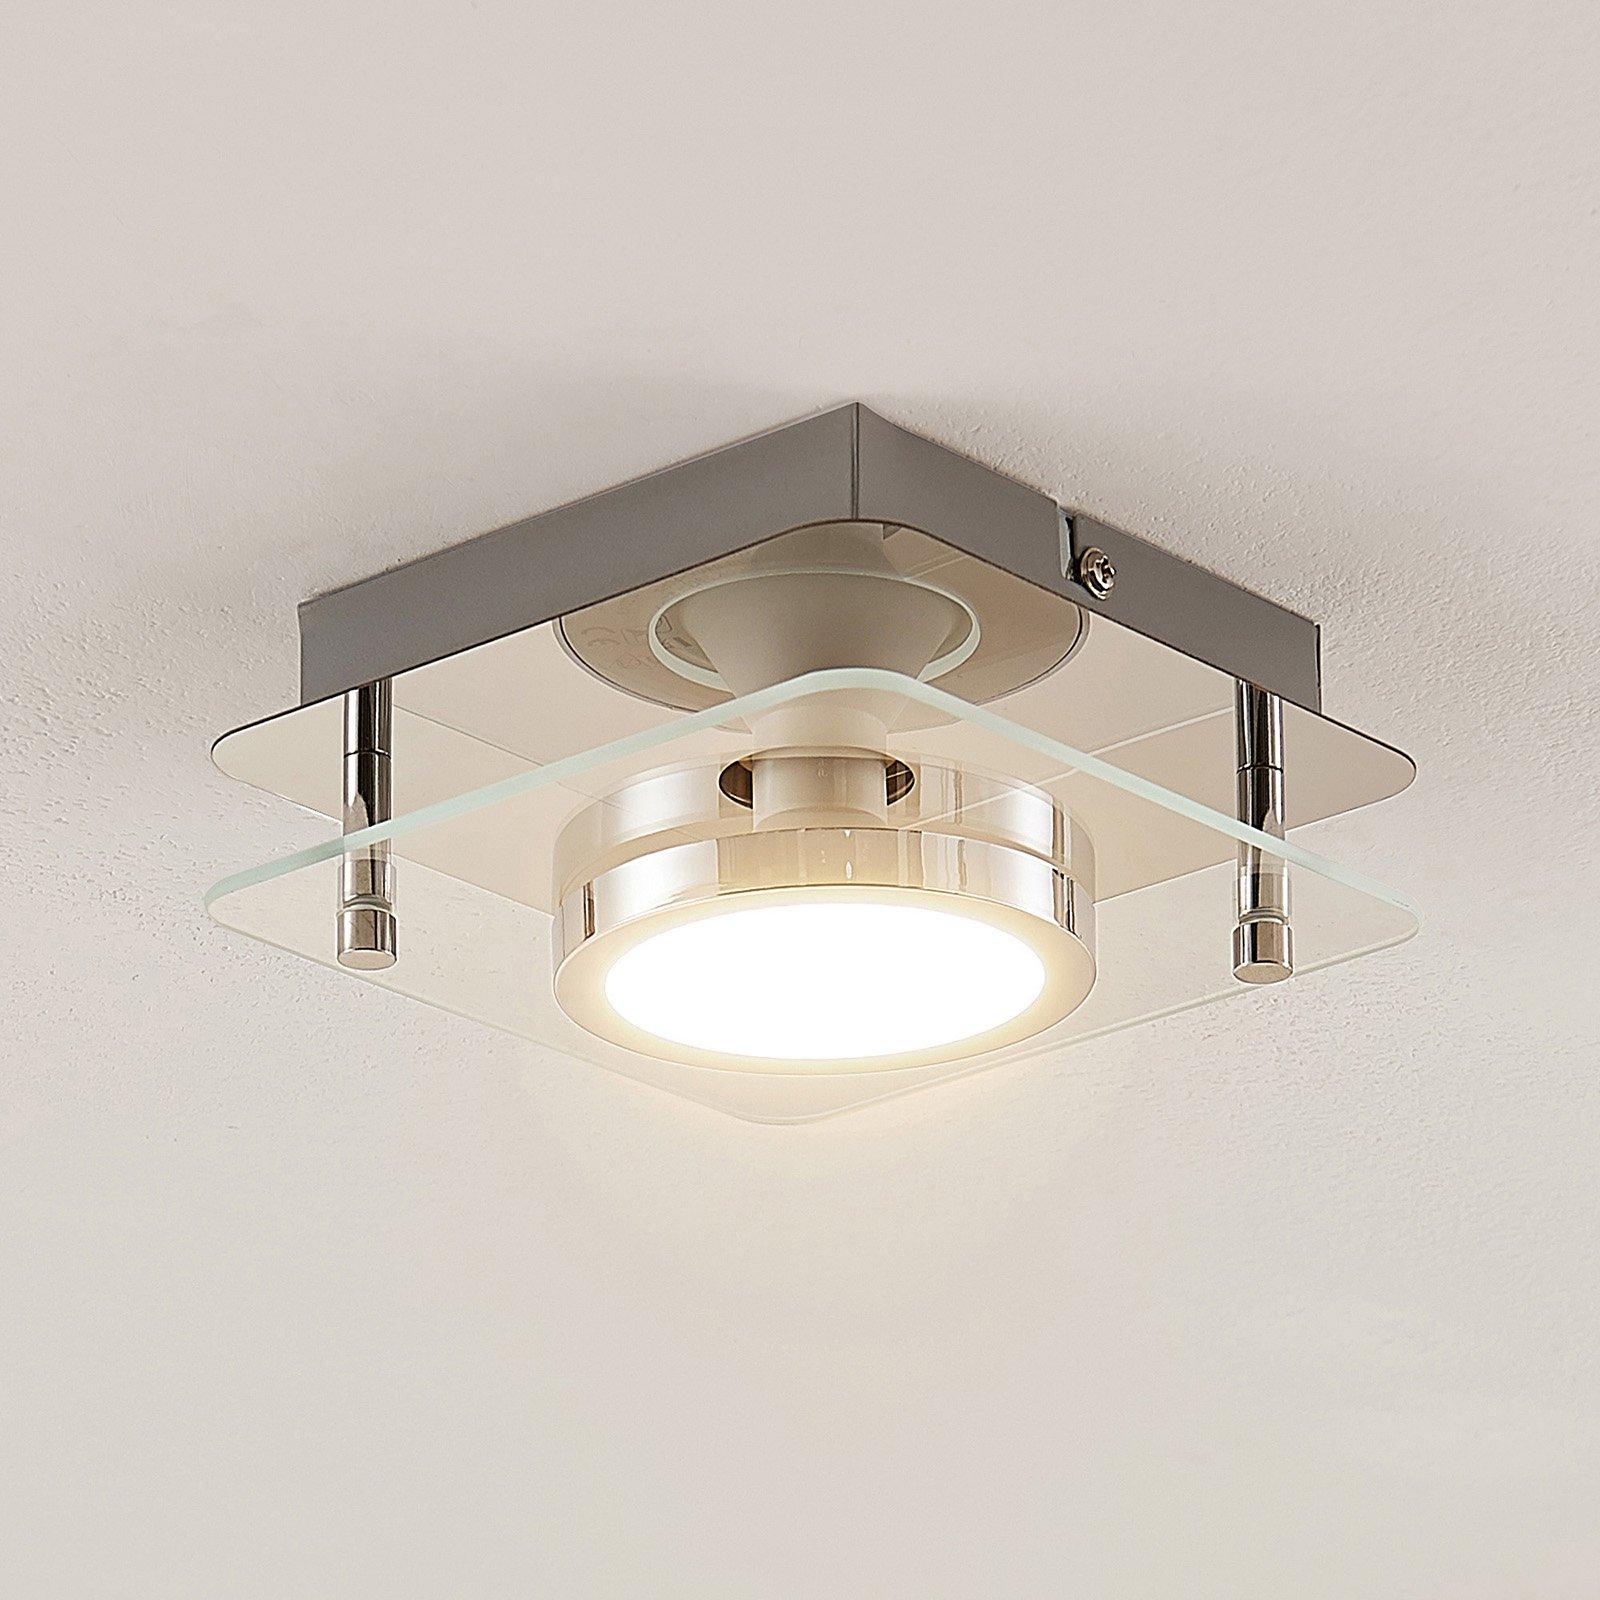 Lindby Gabryl LED-taklampe, 1 lyskilde